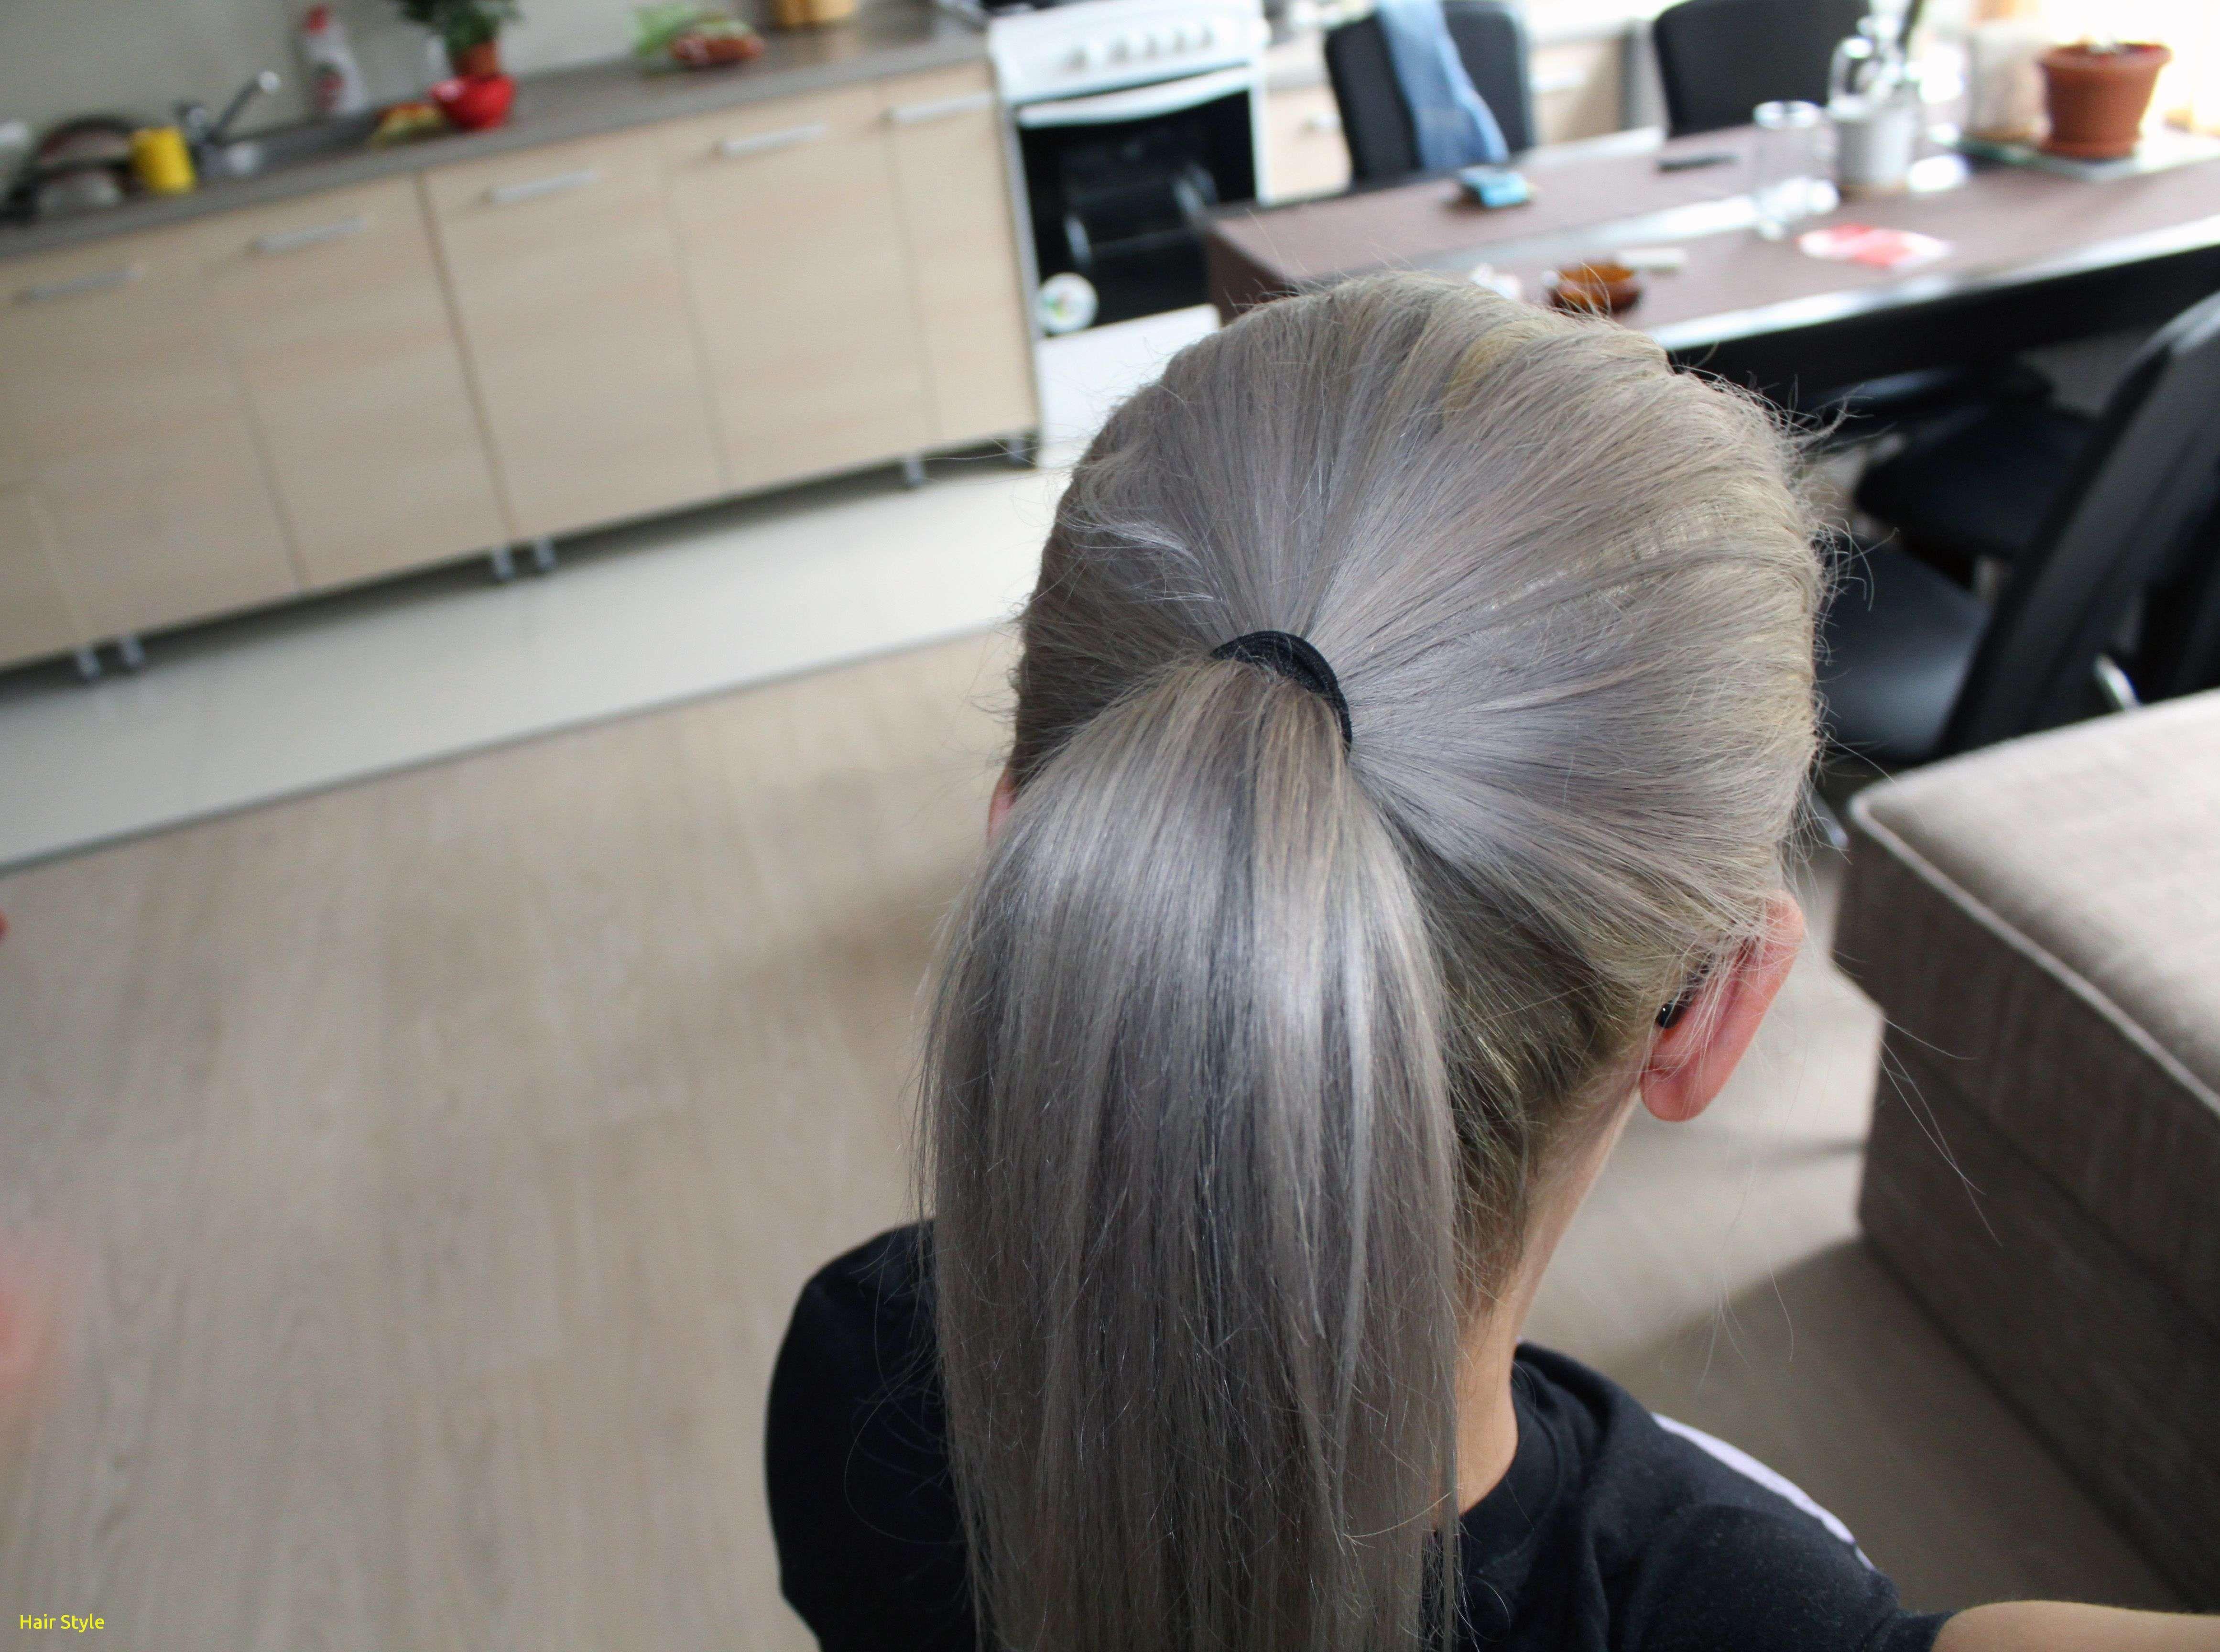 Luxus Wella Illumina 10 1 Frisuren Haarfarben Und Wella Haarfarbe